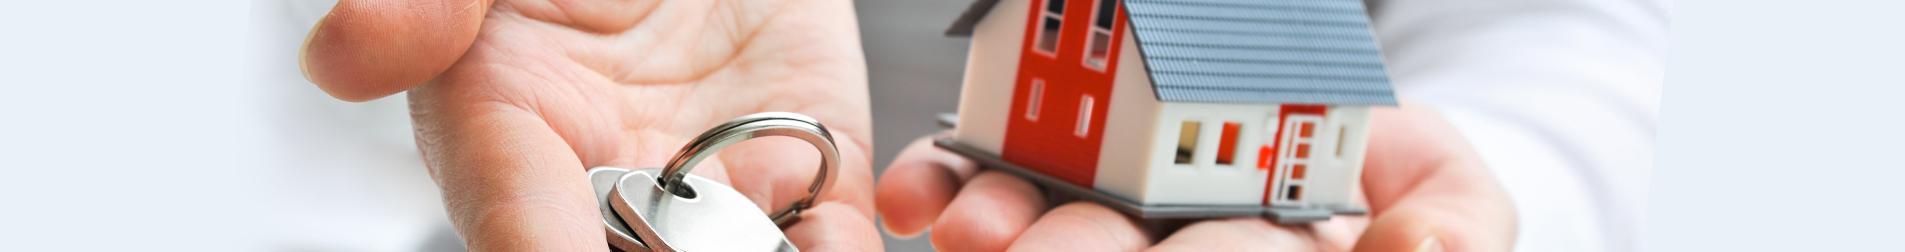 conseil acheter un bien immobilier